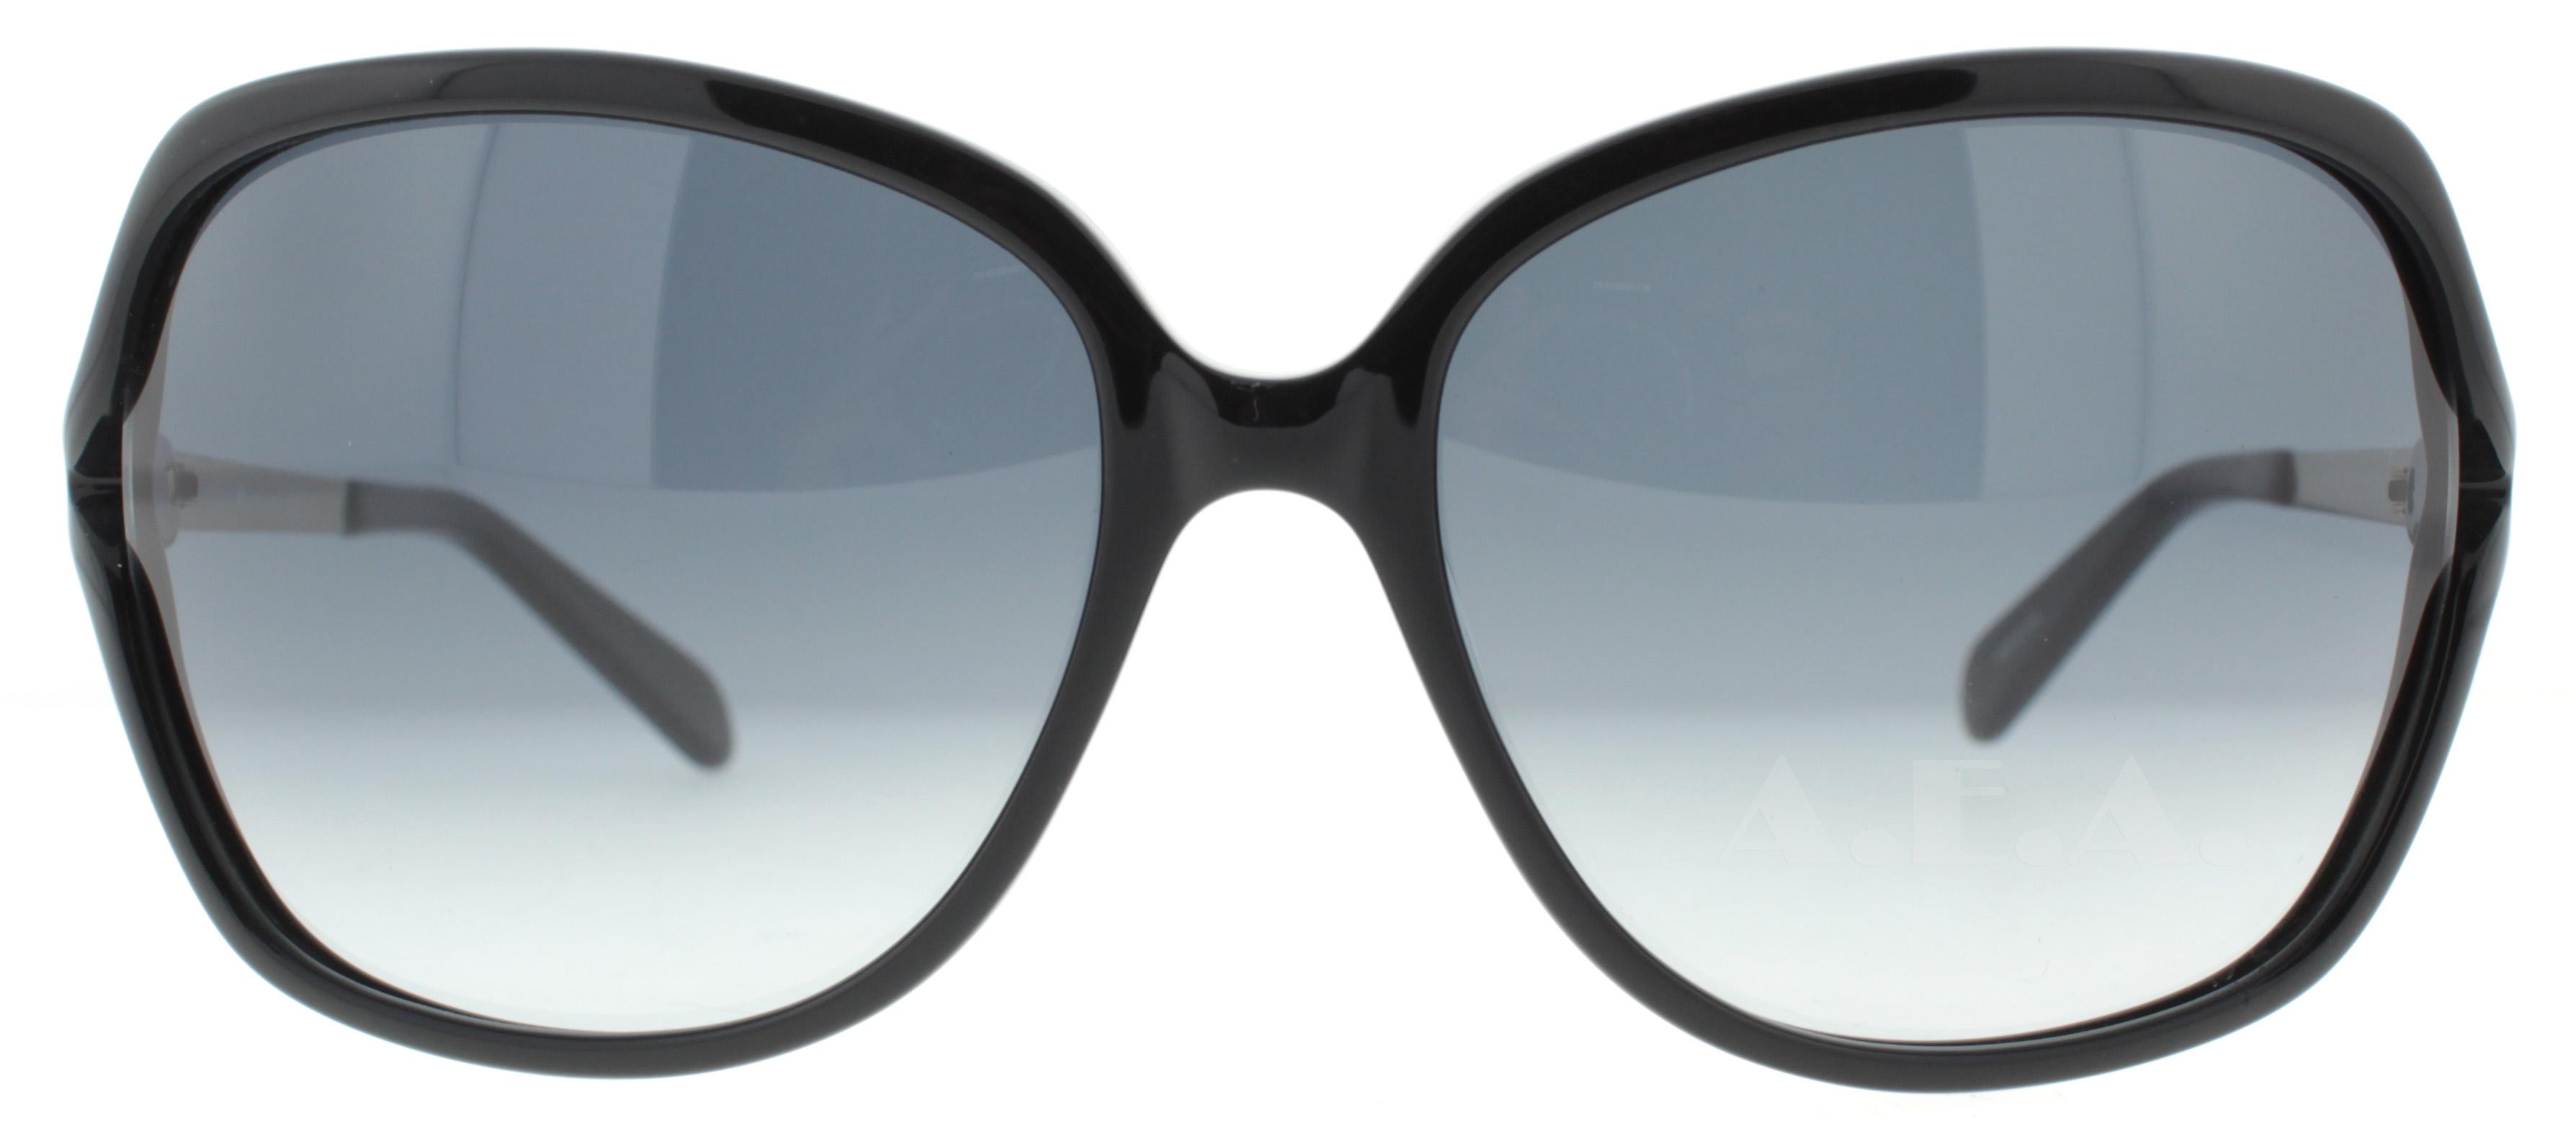 designer eyewear online  of designer